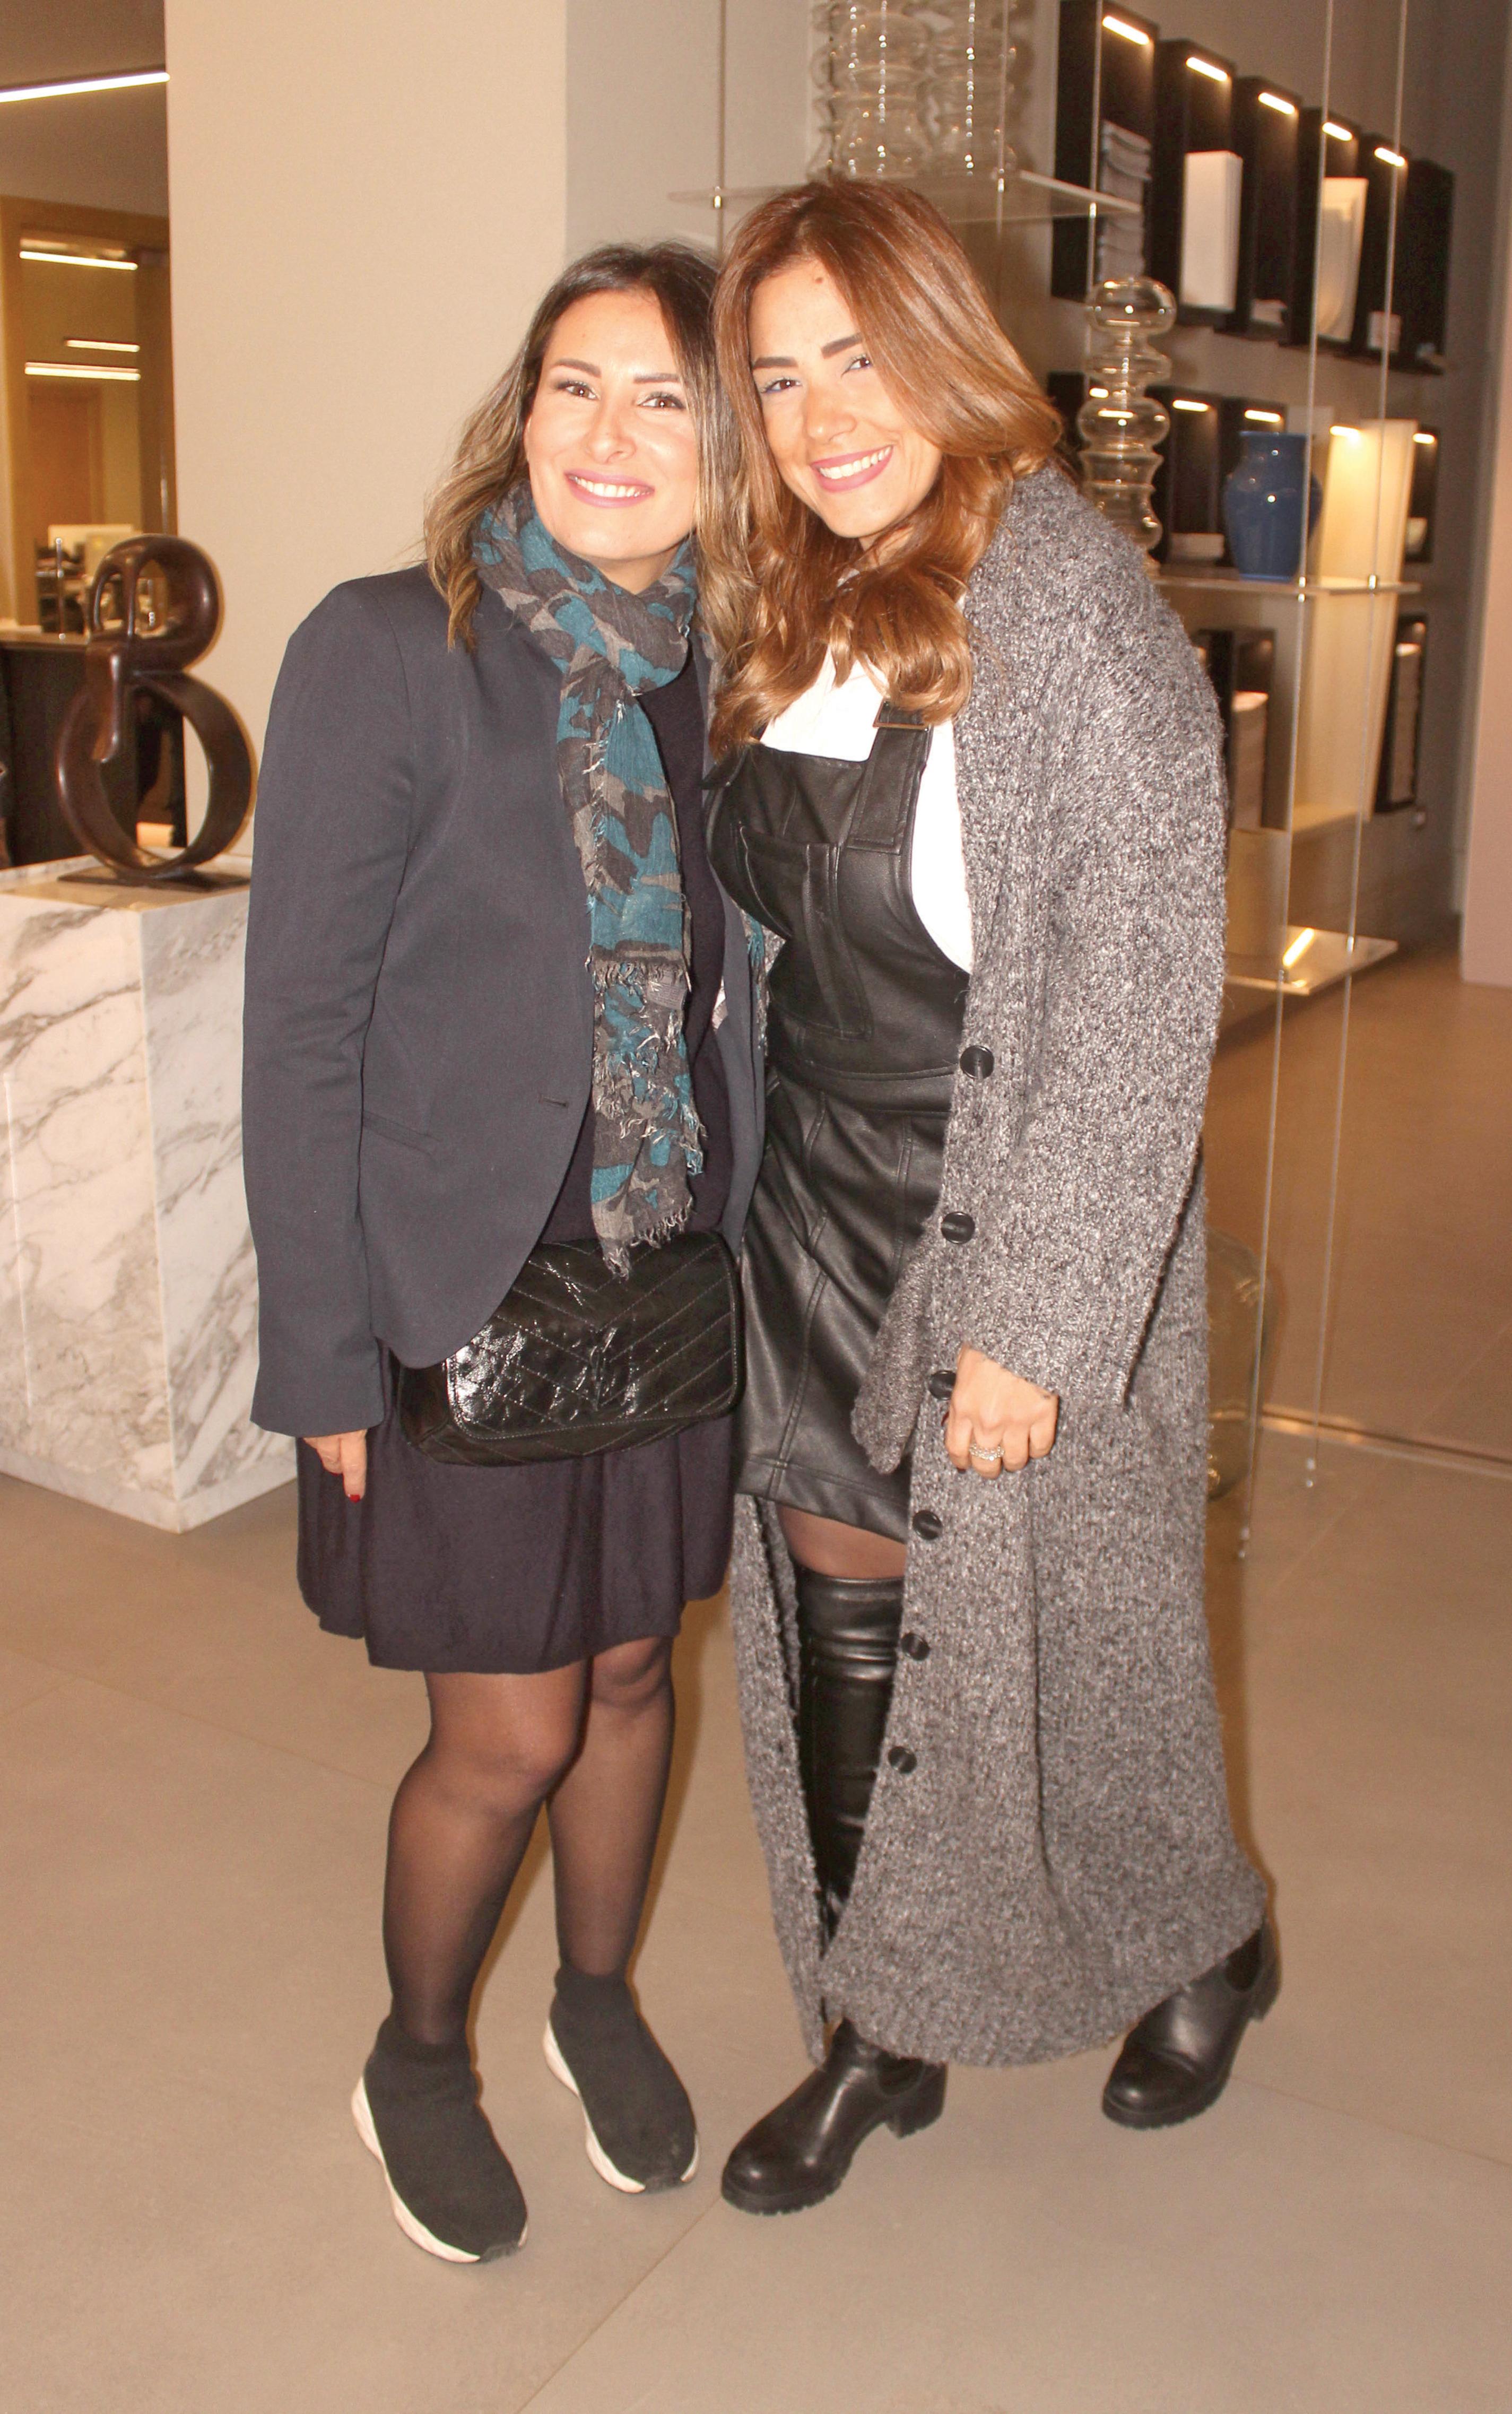 Ms. Zeinab Se'edy & Ms. Nermeen Hasouba